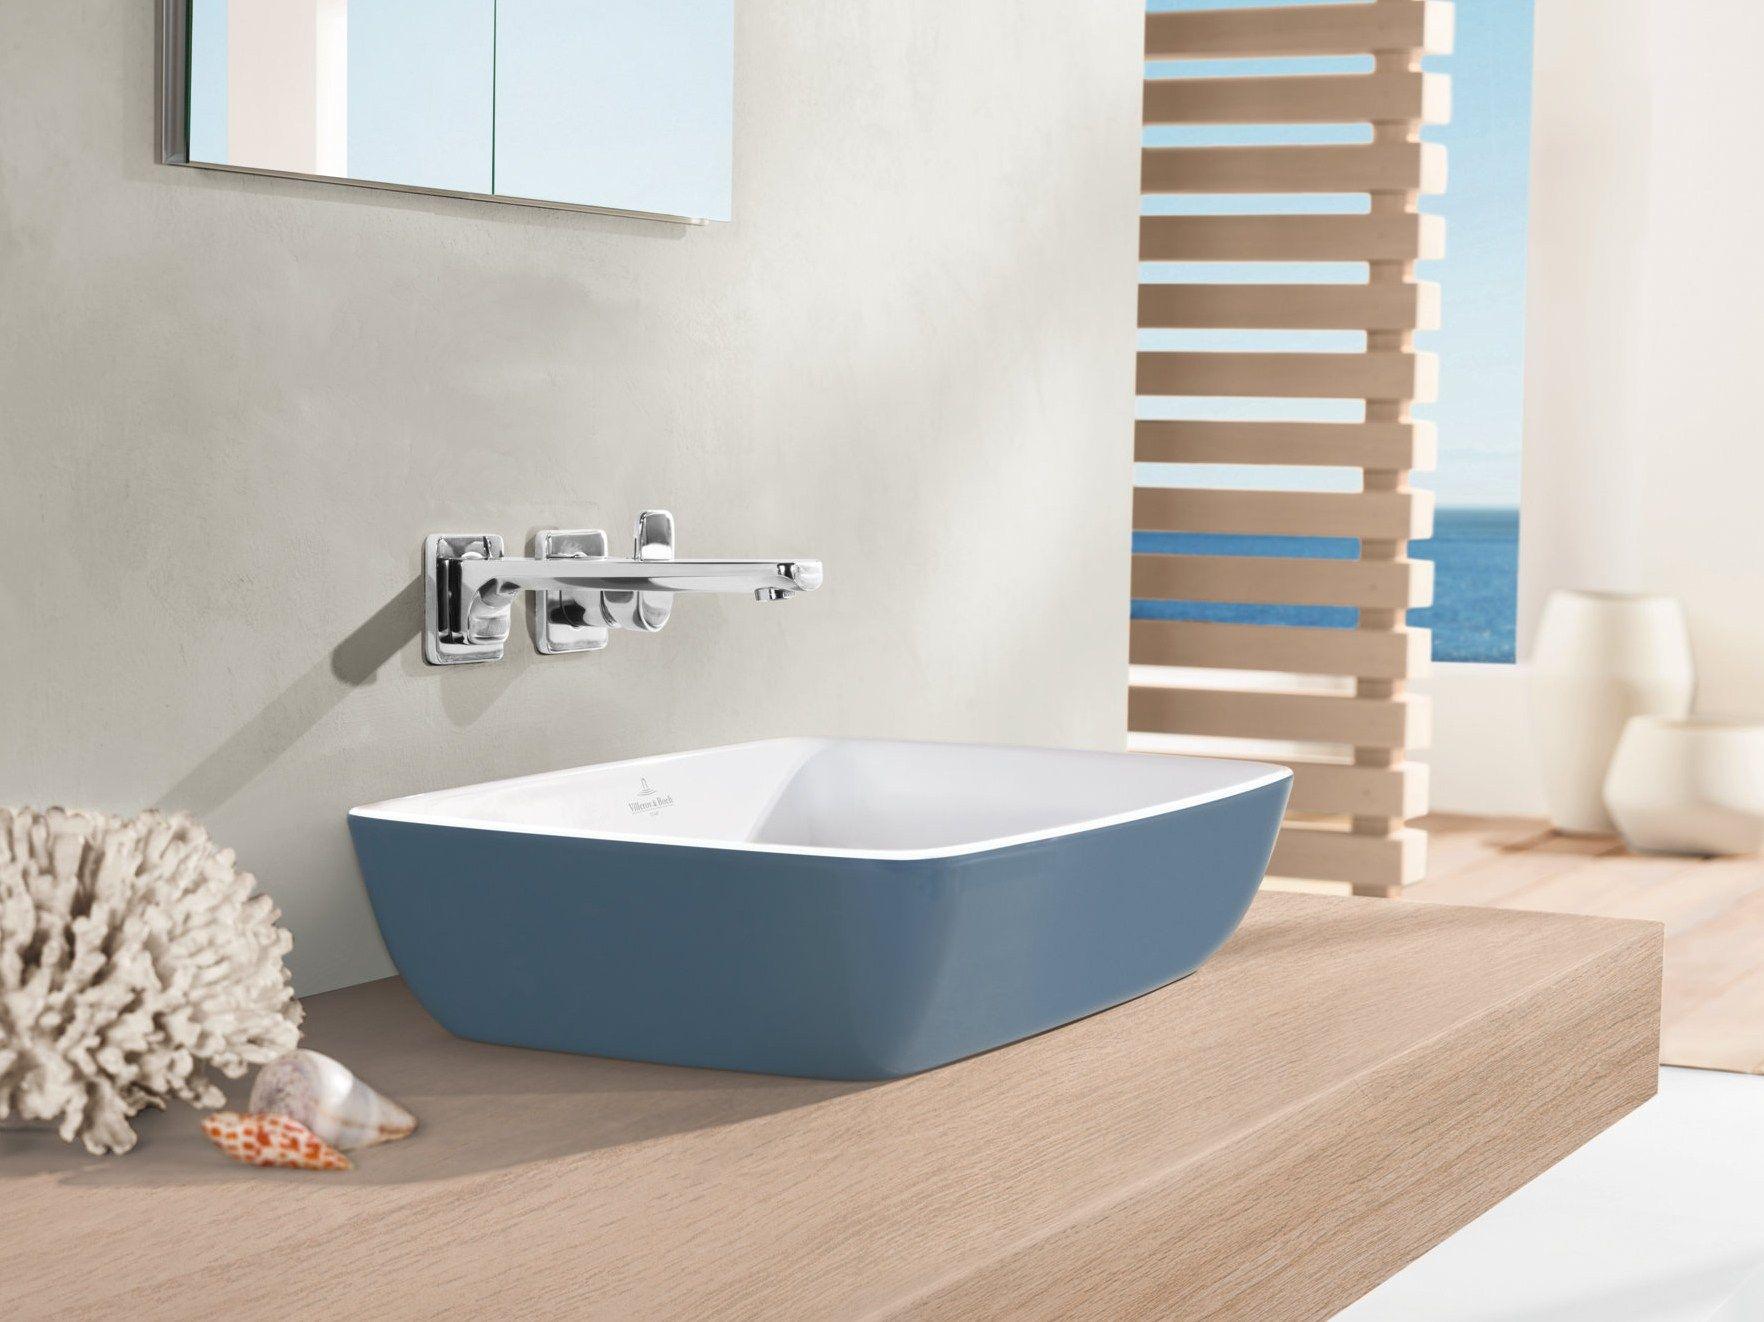 countertop titanceram washbasin artis color line by villeroy boch design gesa hansen